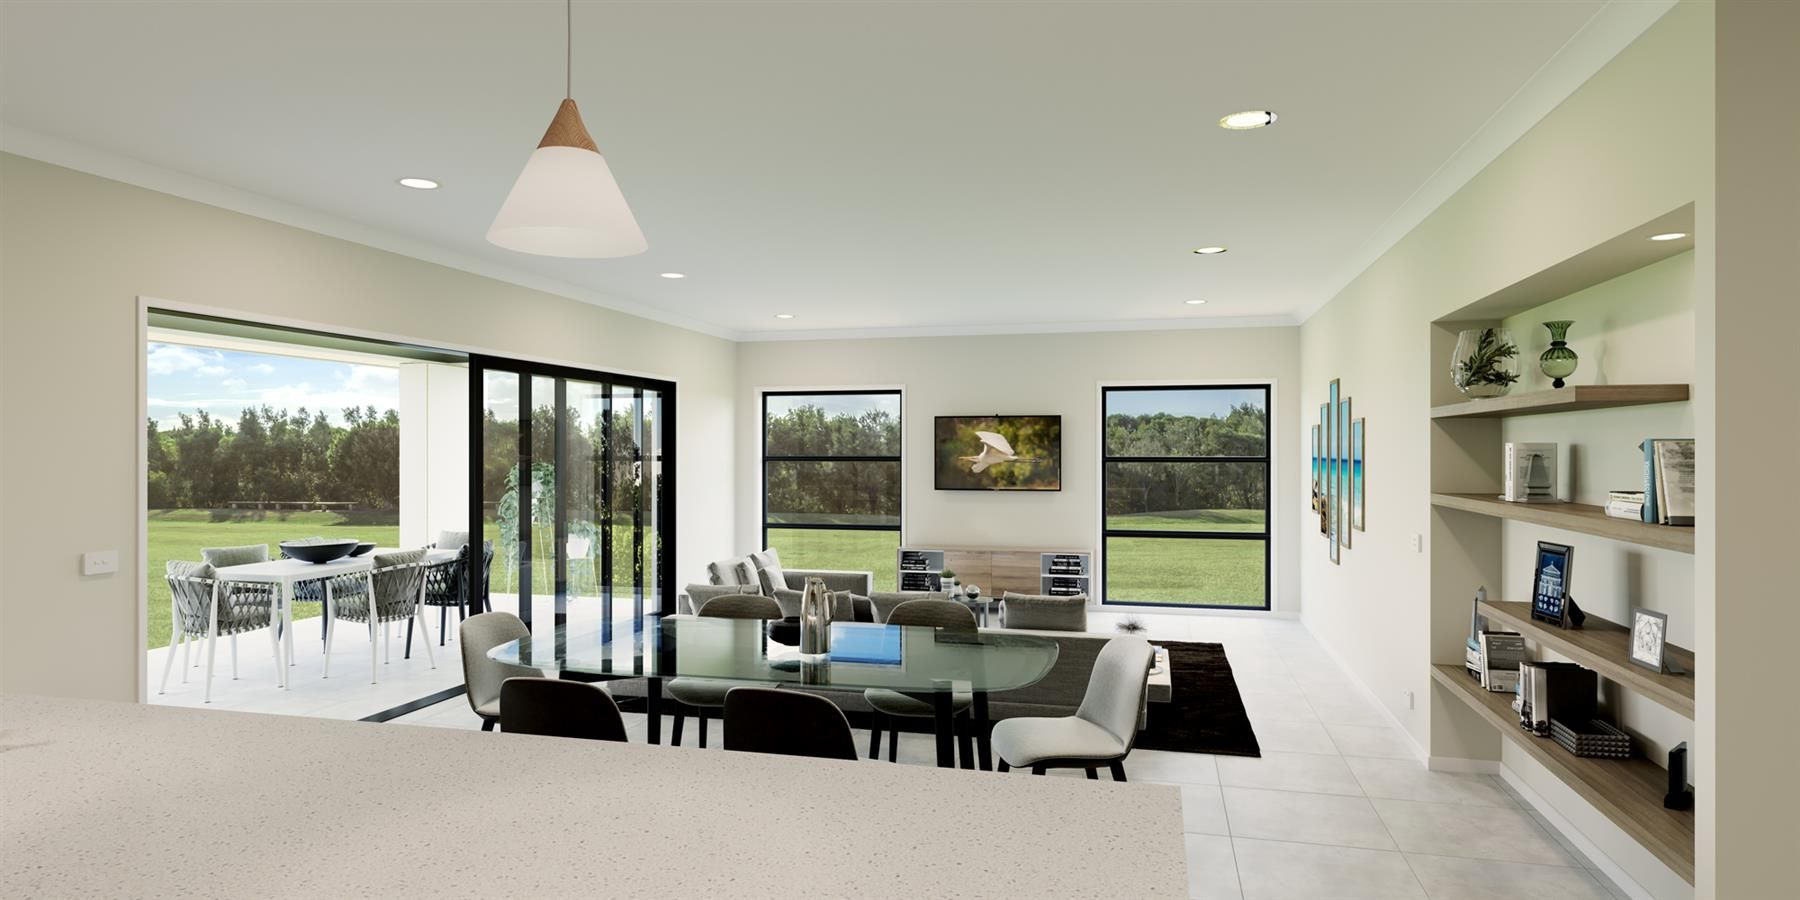 Lot 323 Shelley Close, Woolgoolga NSW 2456, Image 1